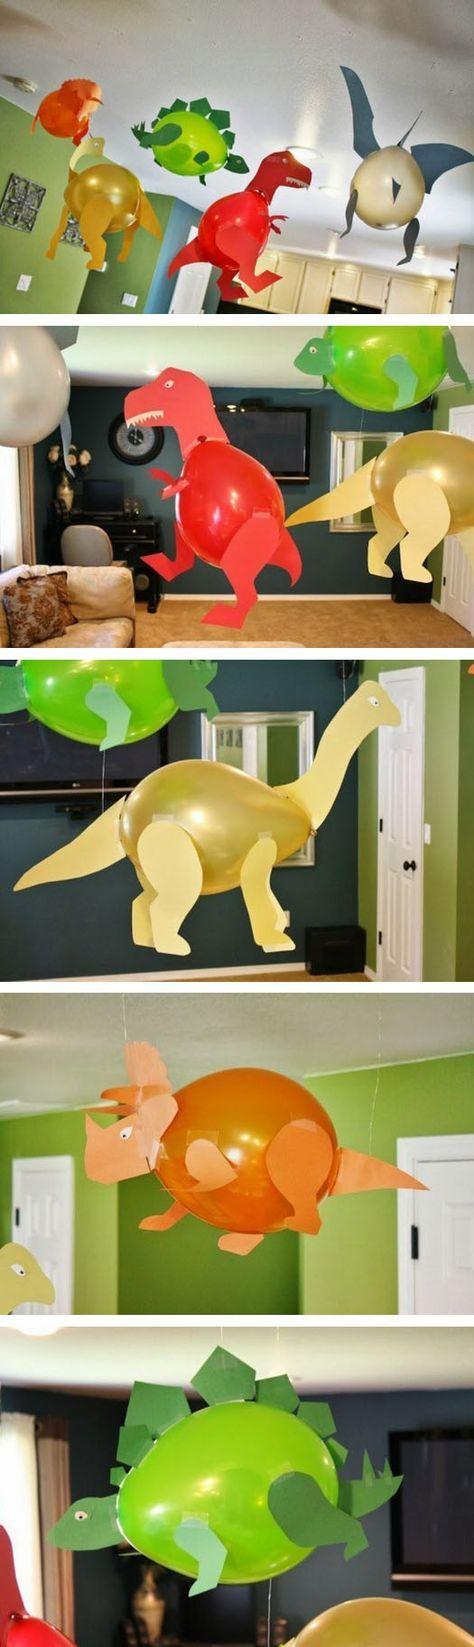 Ballons ang paper is all you need to make home decor for kids party  #art #inspiration #handmade #dinosaur Украшаем динозаврами дом к детском празднику при помощи воздушных шаров и бумаги